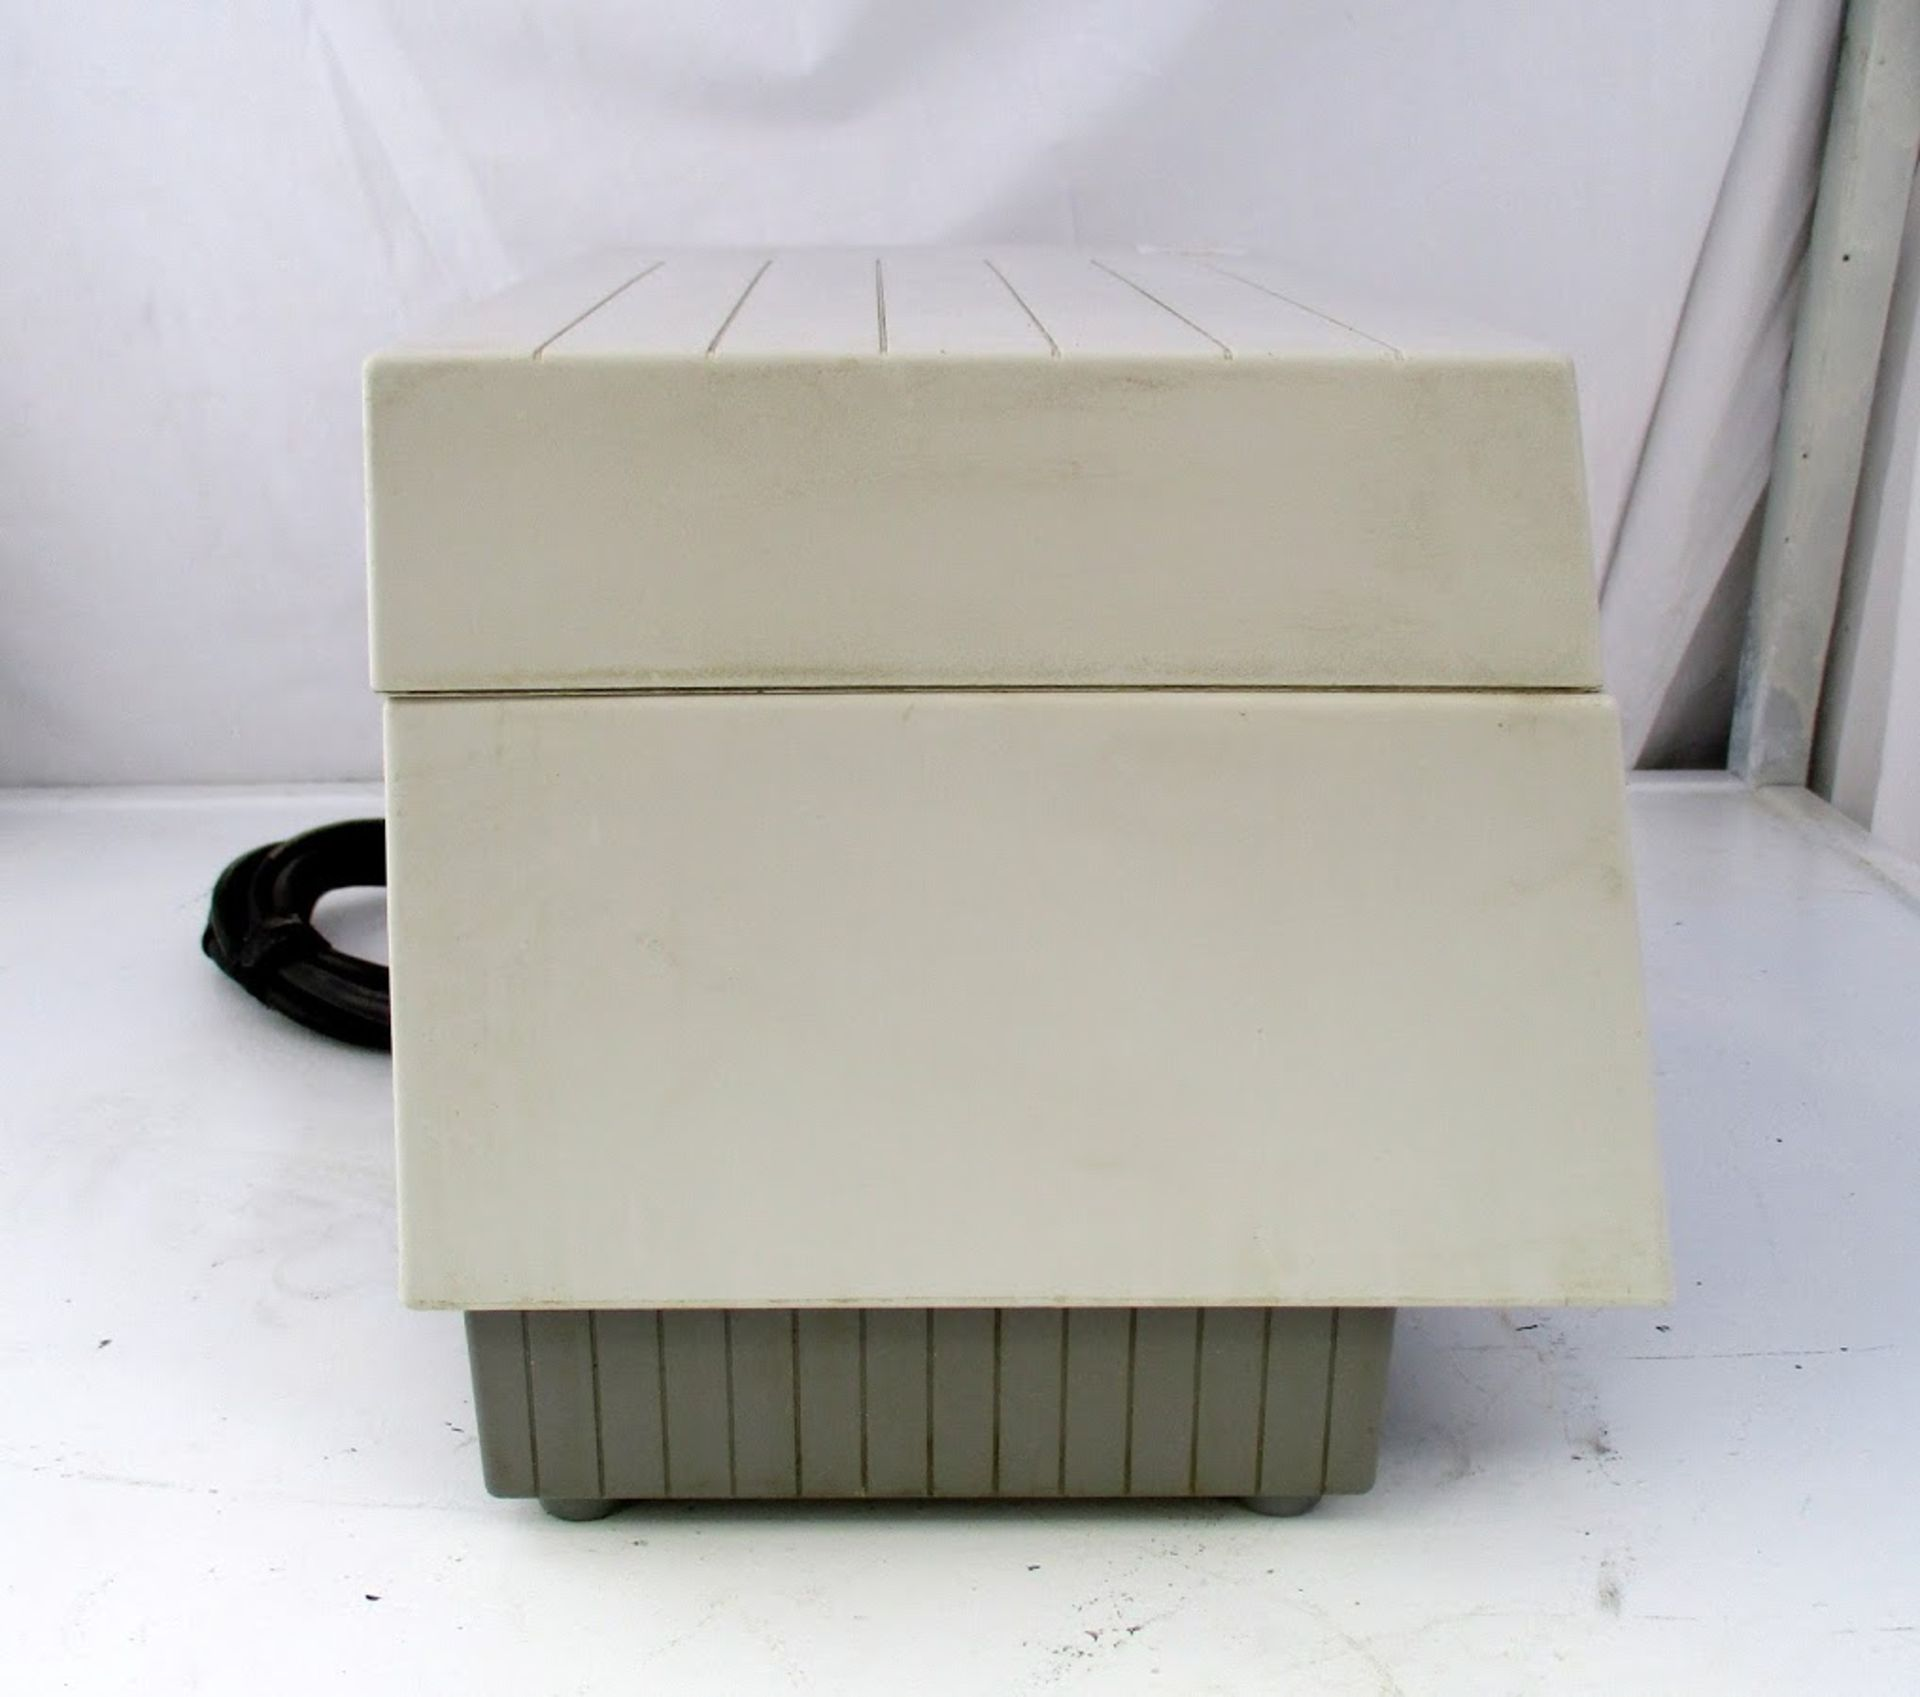 Whaledent Biosonic Ultrasonic Cleaner - Image 2 of 4